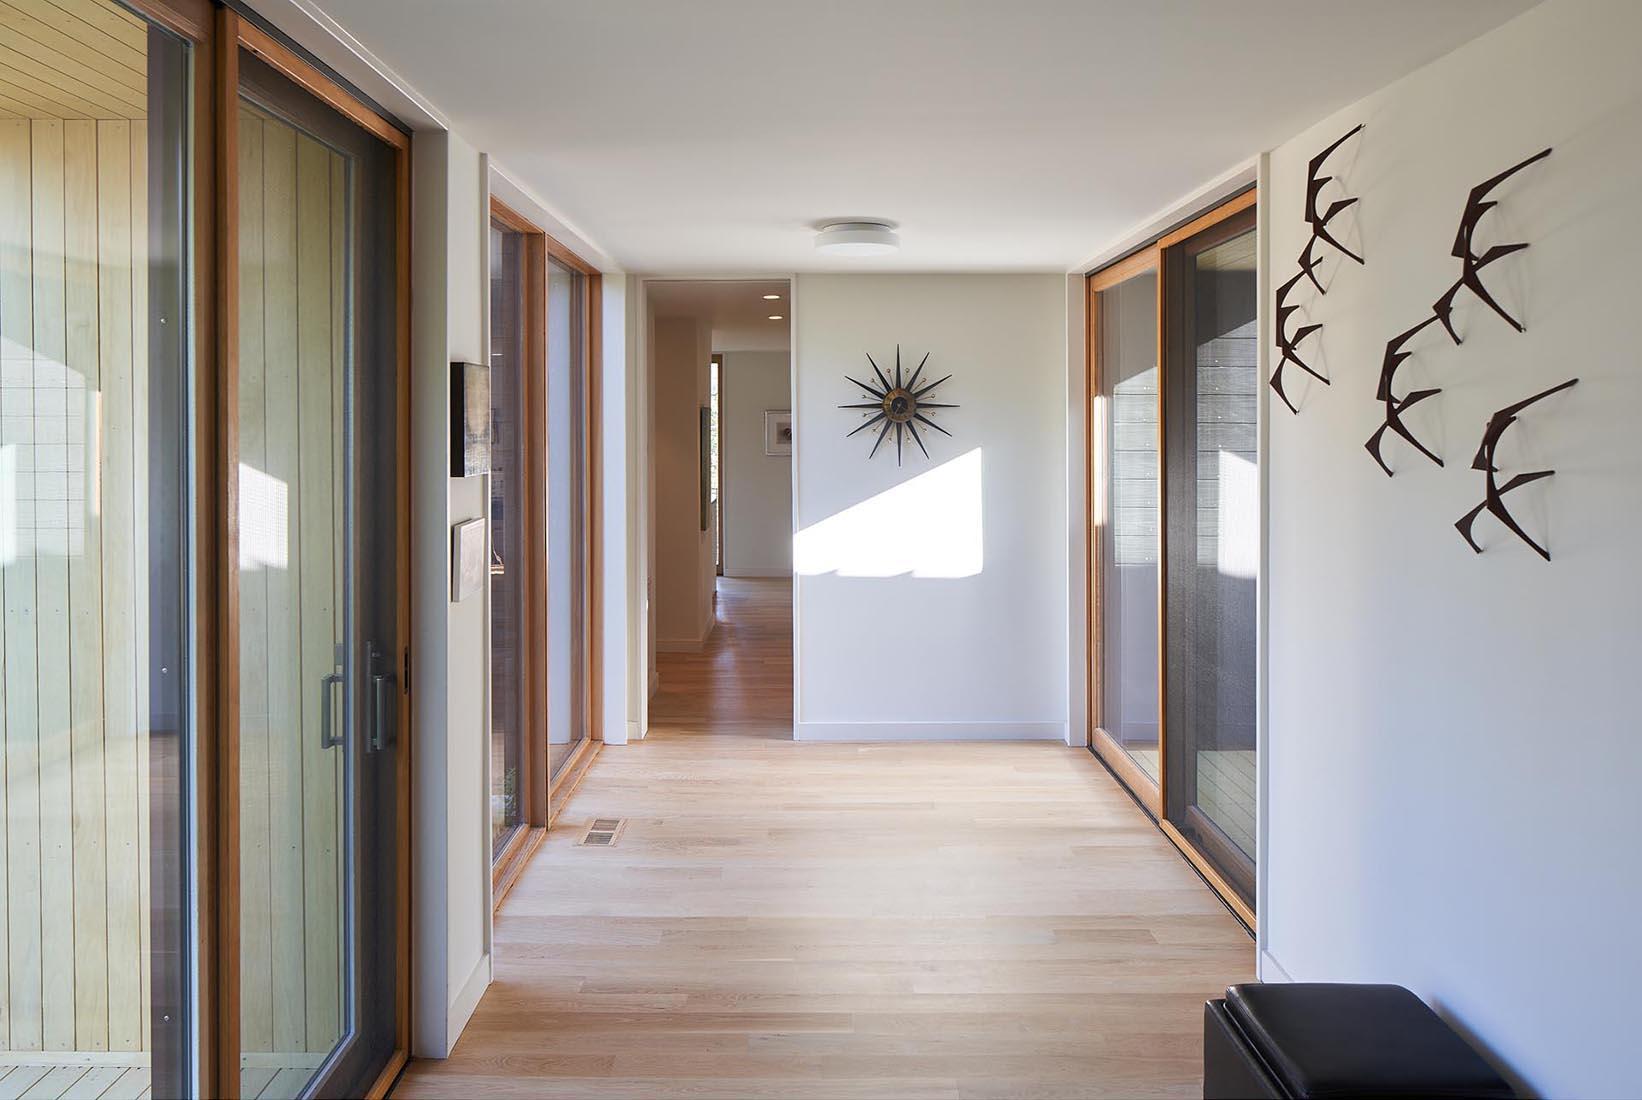 A modern hallway with light wood flooring.